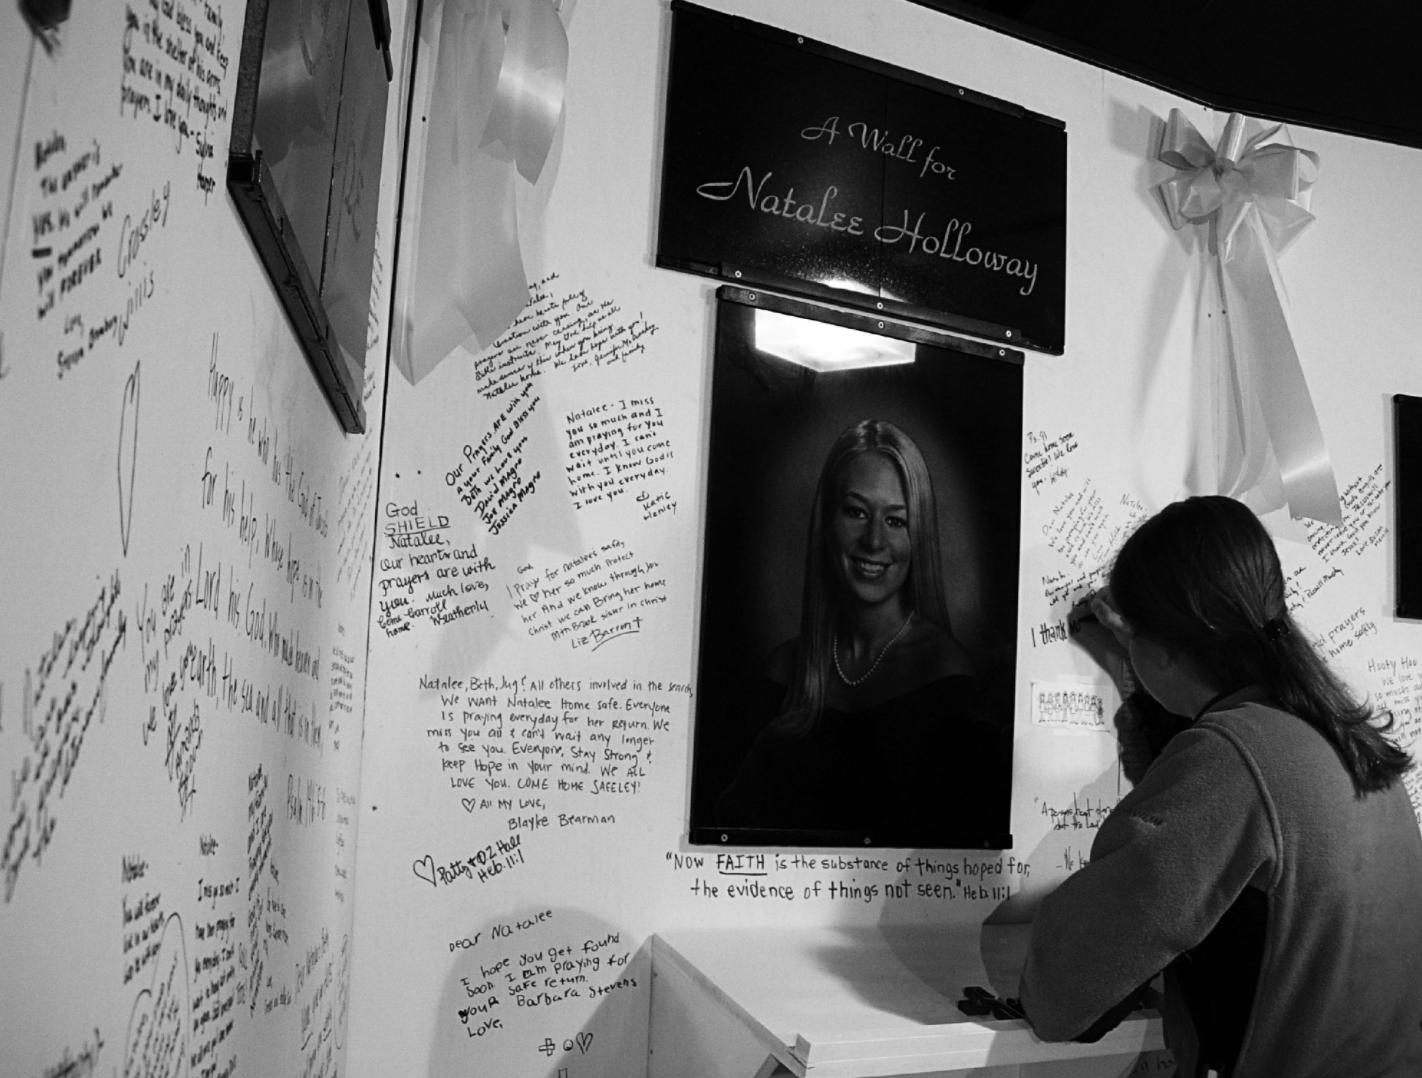 New Evidence Suggests Natalee Holloway Body Found: Photo:AuburnPilot, WikiCommons, No Change